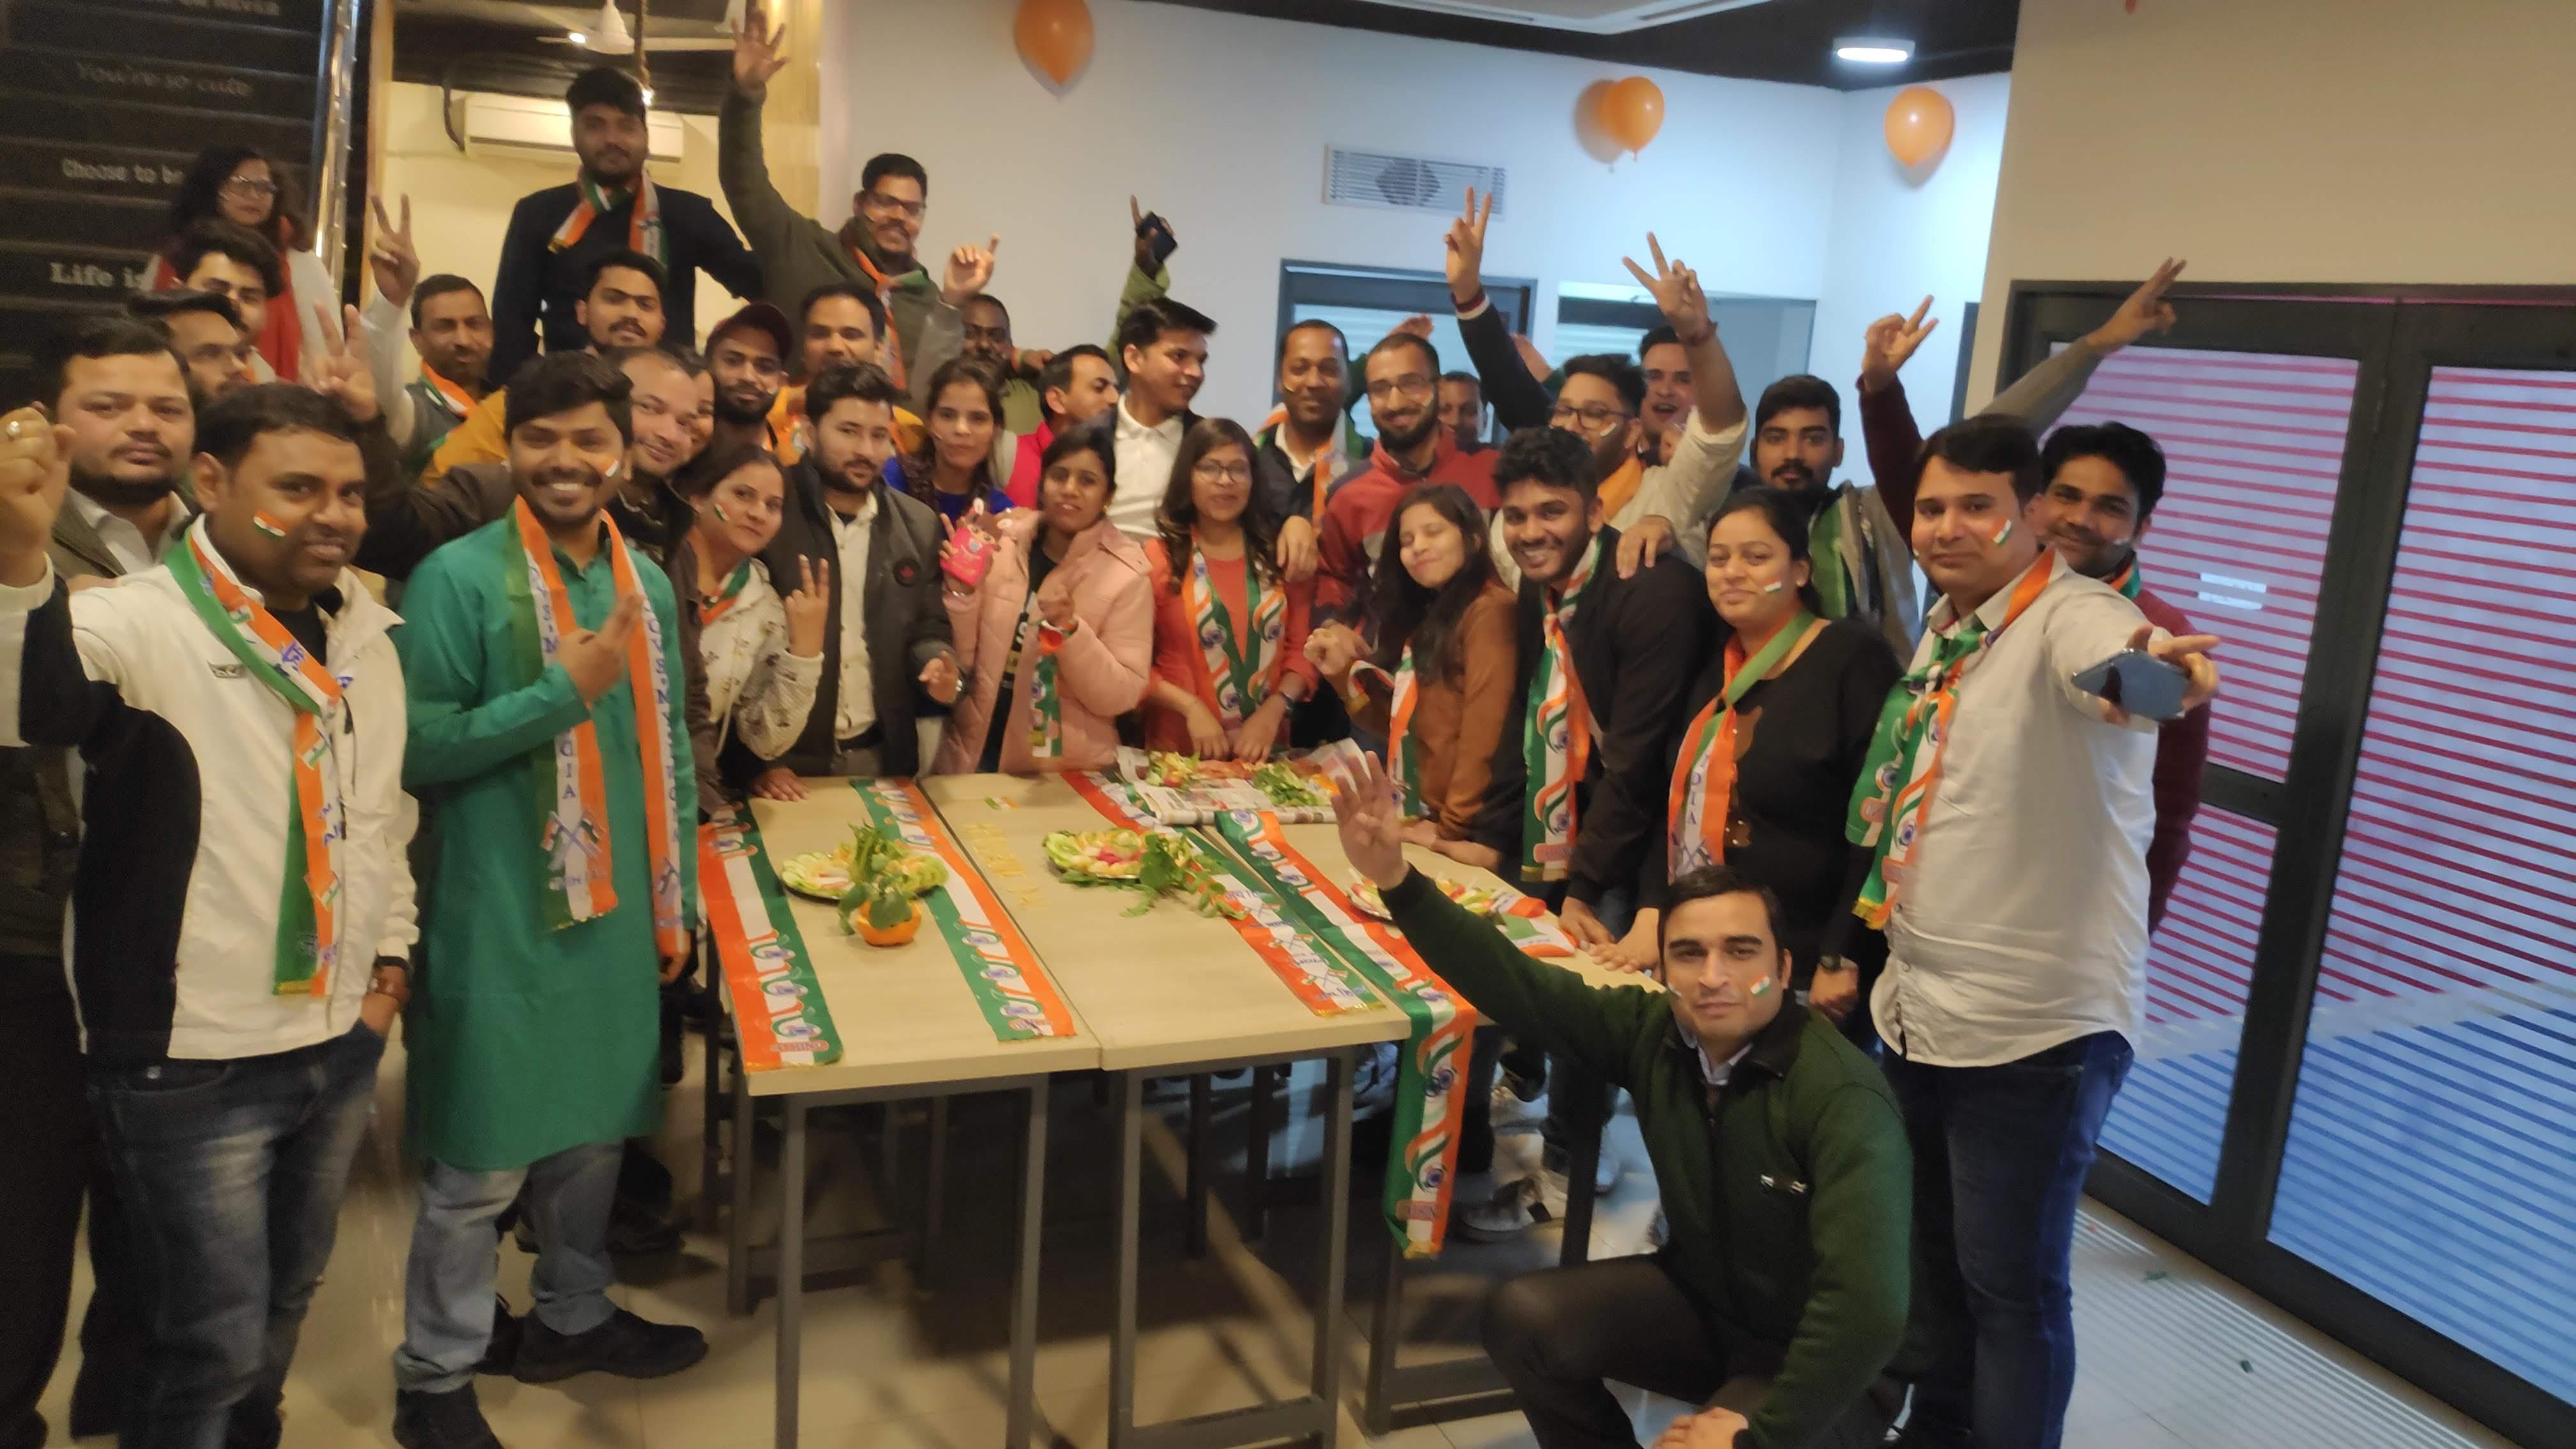 RightWave celebrates the 70th anniversary of India's Republic